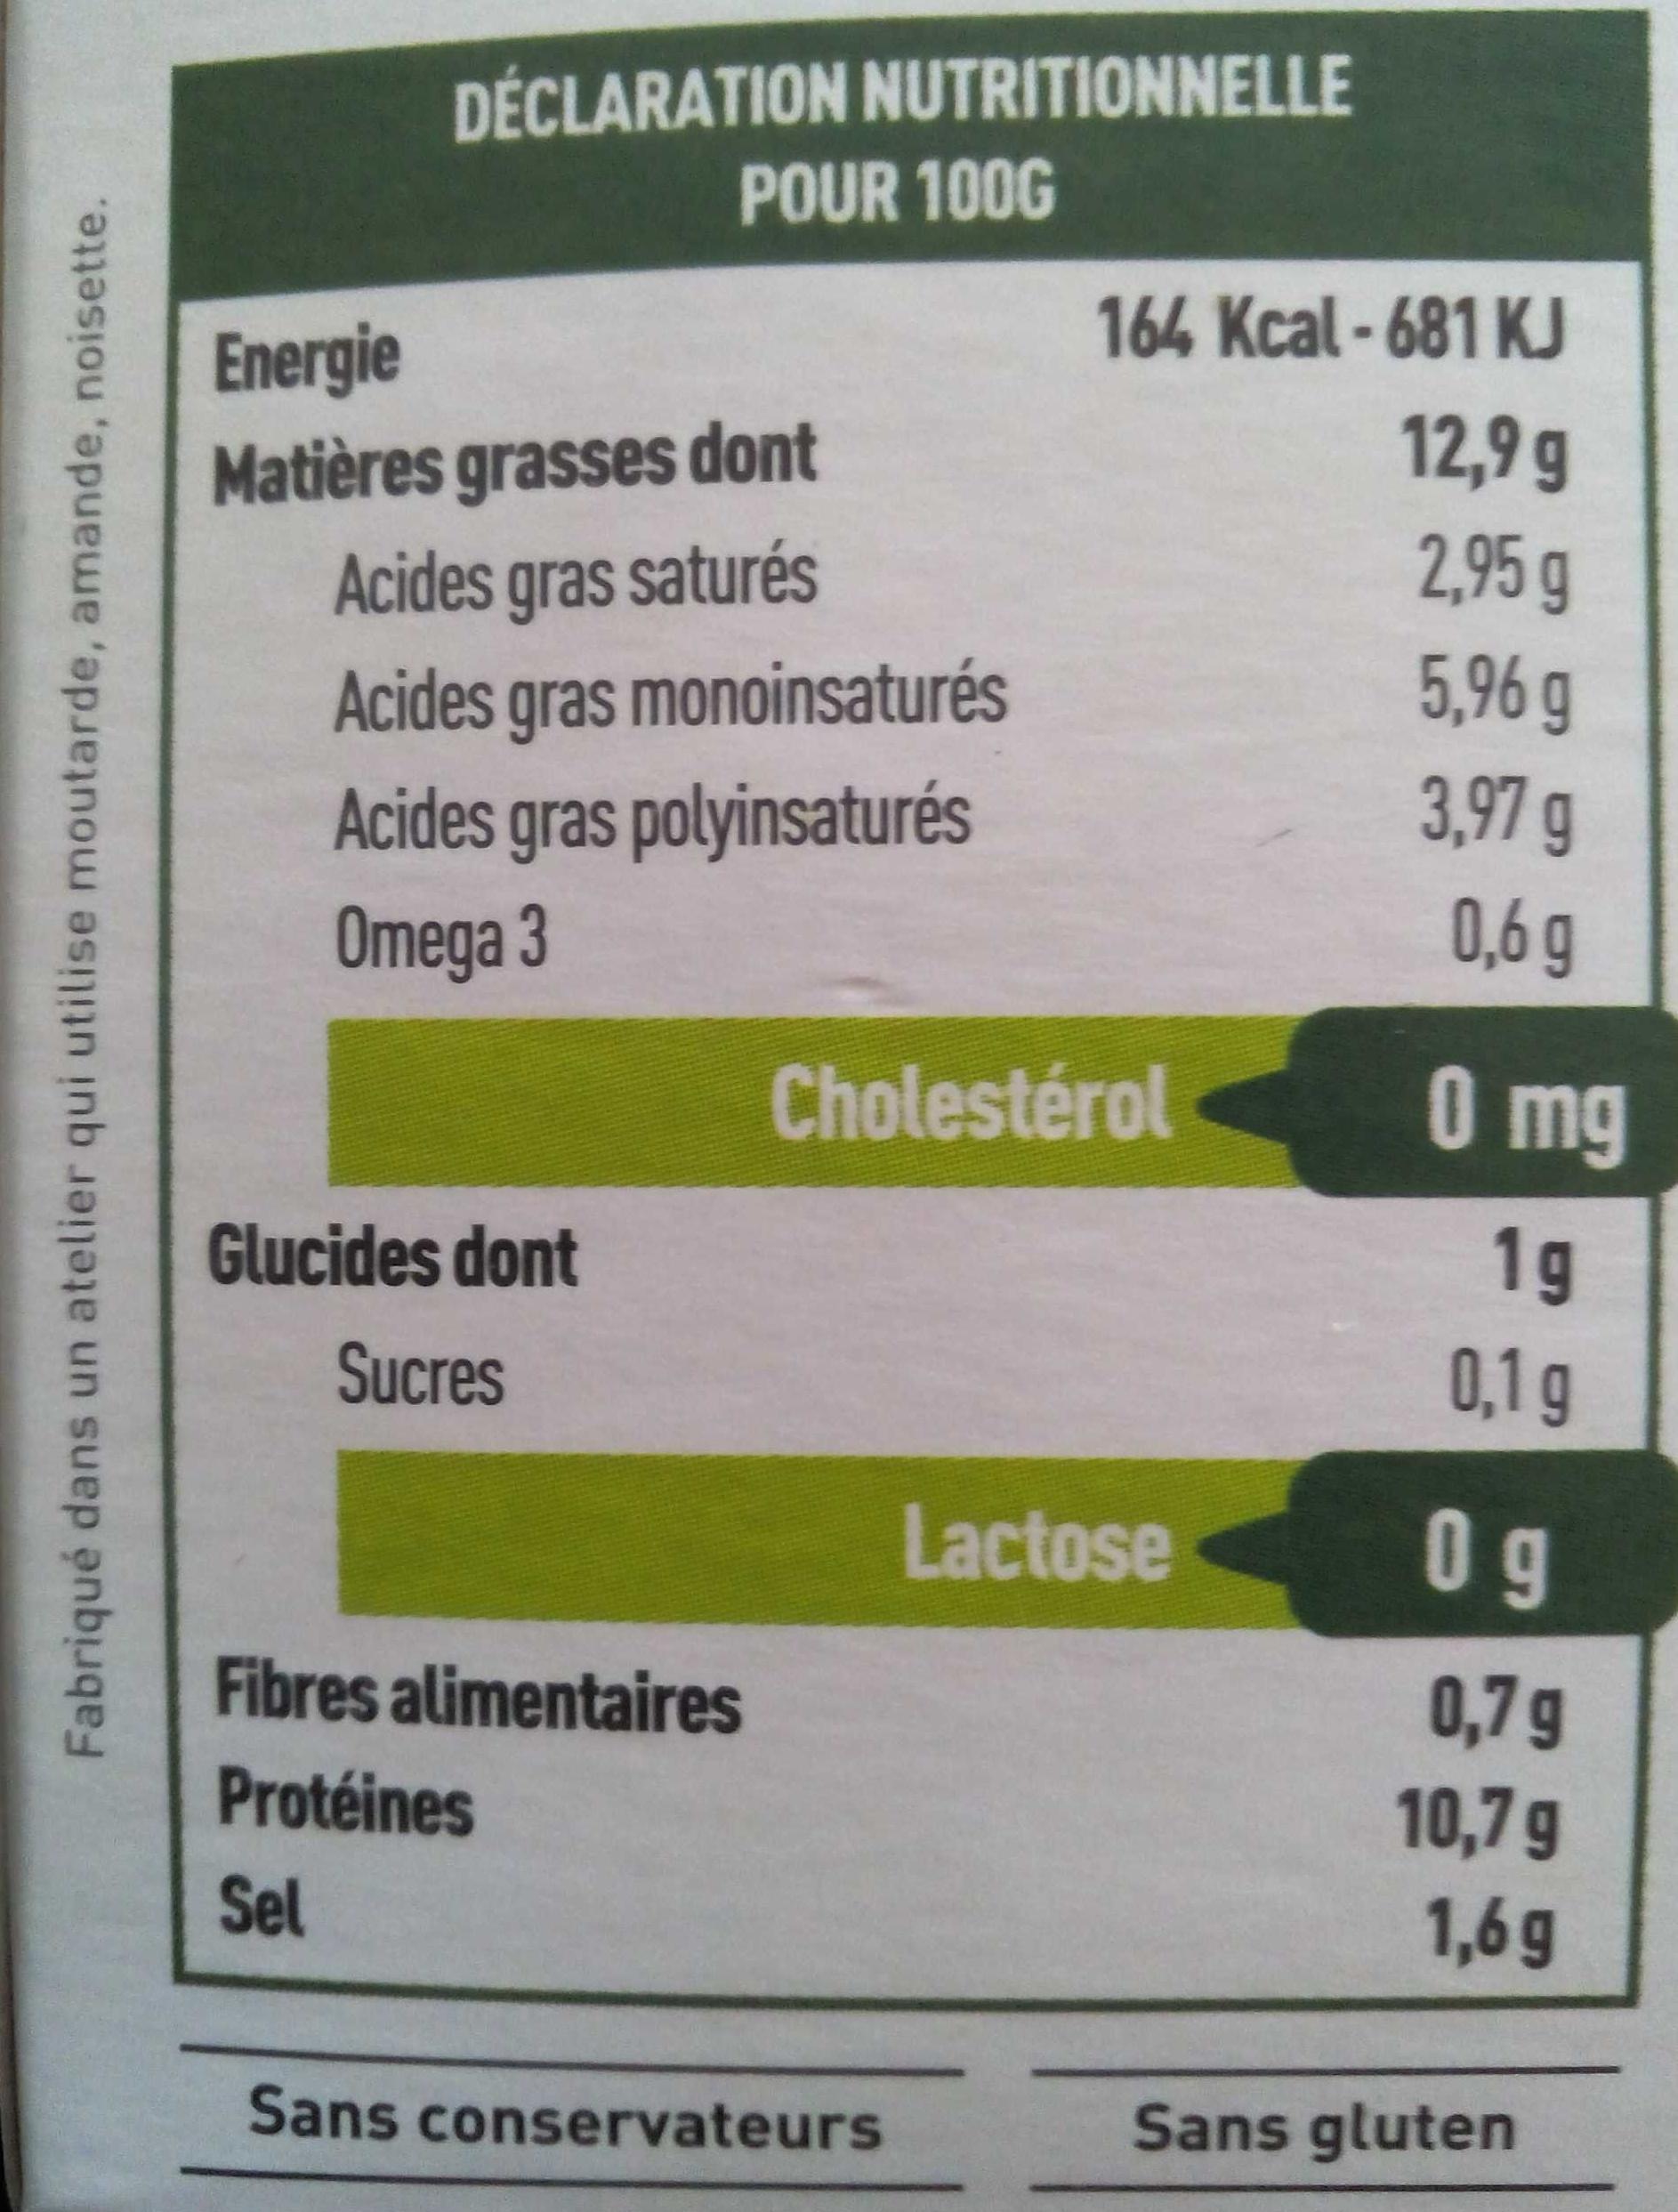 Tartine & moi ail et fines herbes - Voedingswaarden - fr